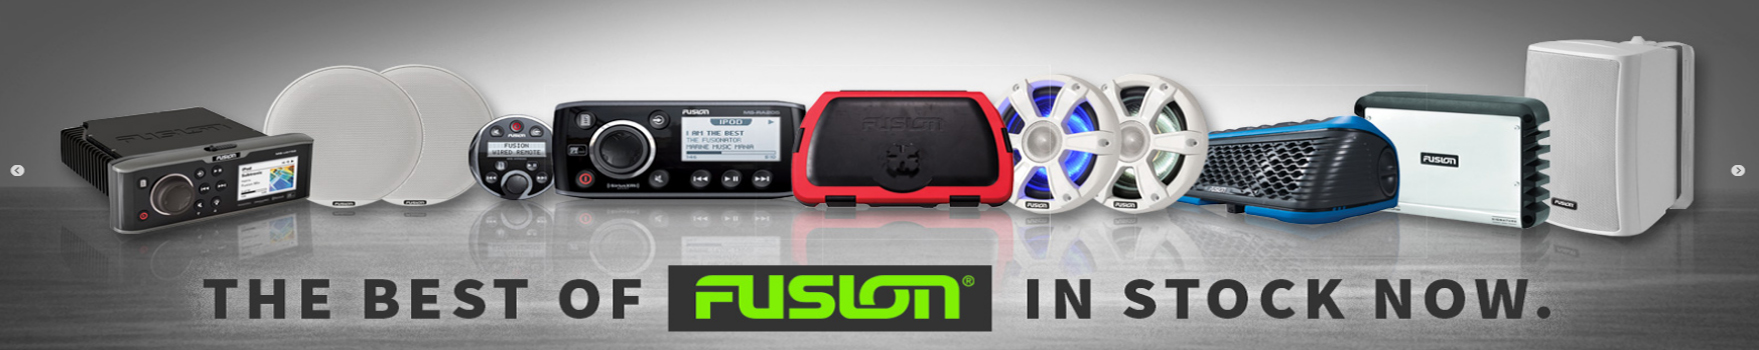 03.Fusion-Header-Northside-Marine